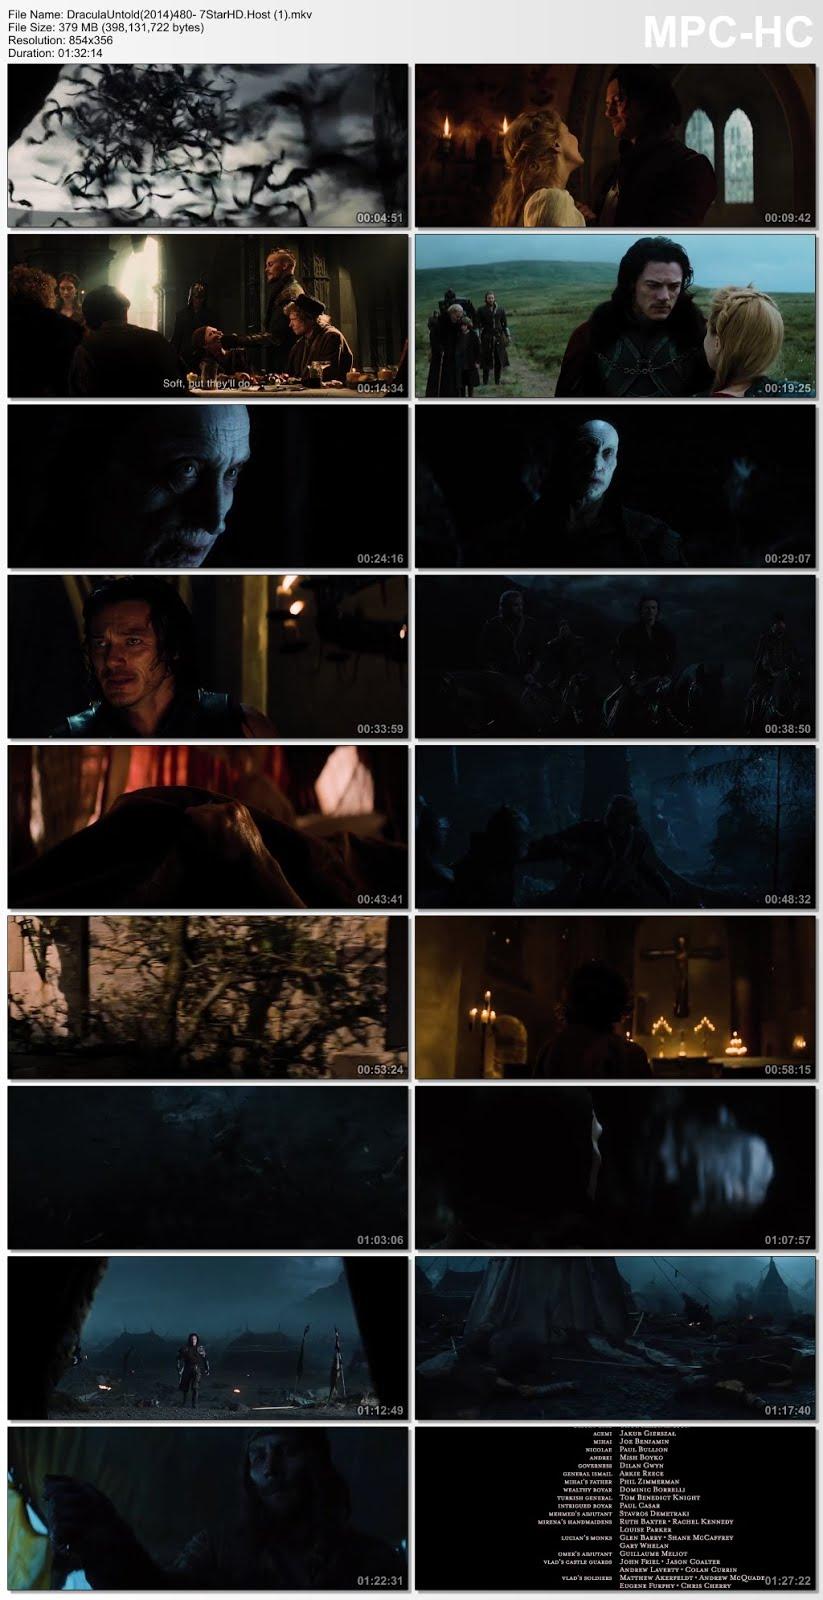 Dracula Untold (2014) Dual Audio Hindi Dubbed Full Movie 350MB BluRay 480p x264 Download